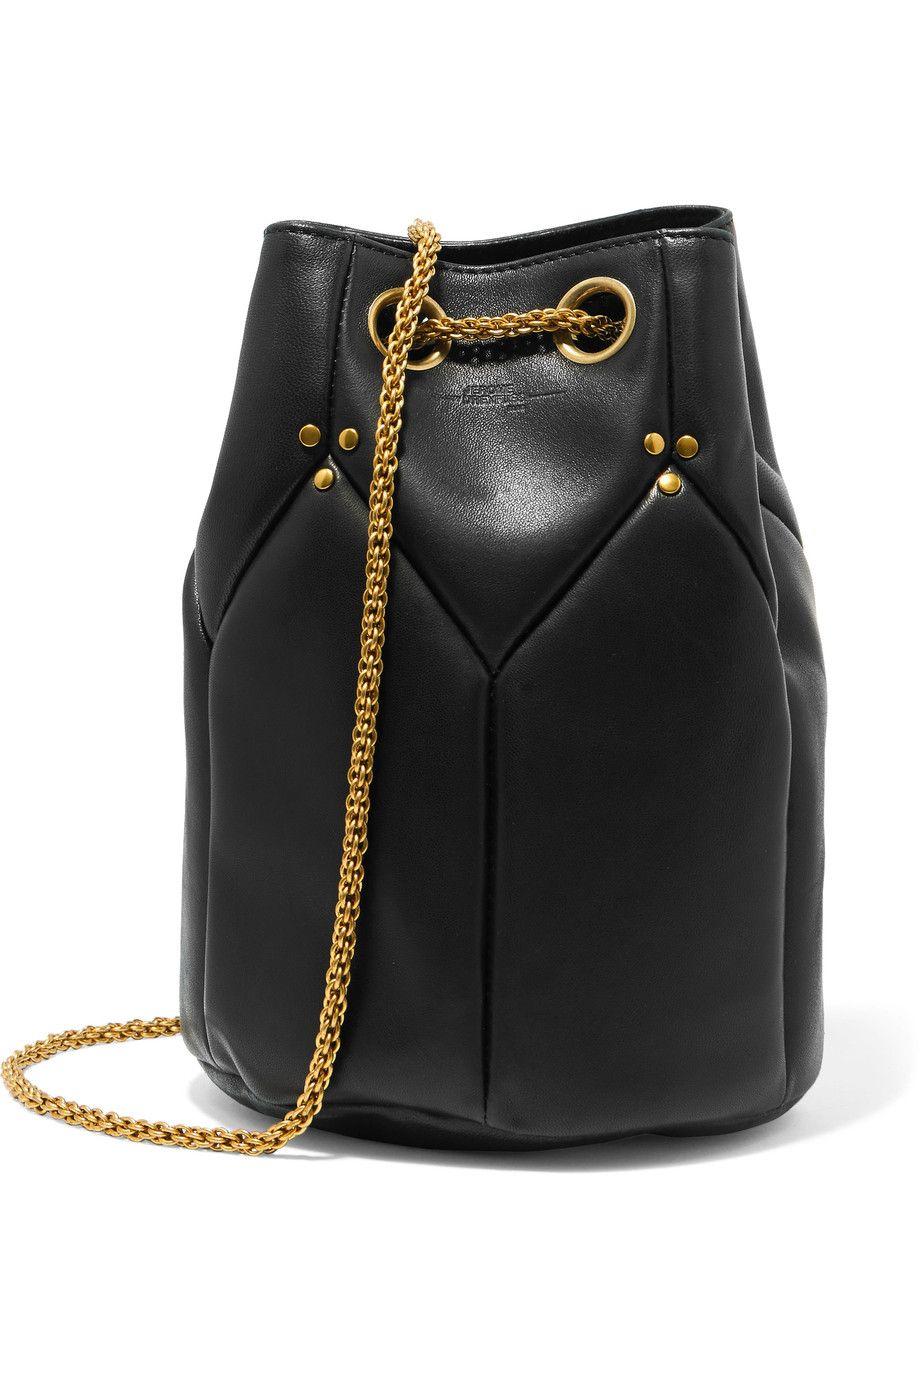 039737f968 JÉRÔME DREYFUSS .  jérômedreyfuss  bags  shoulder bags  leather  bucket